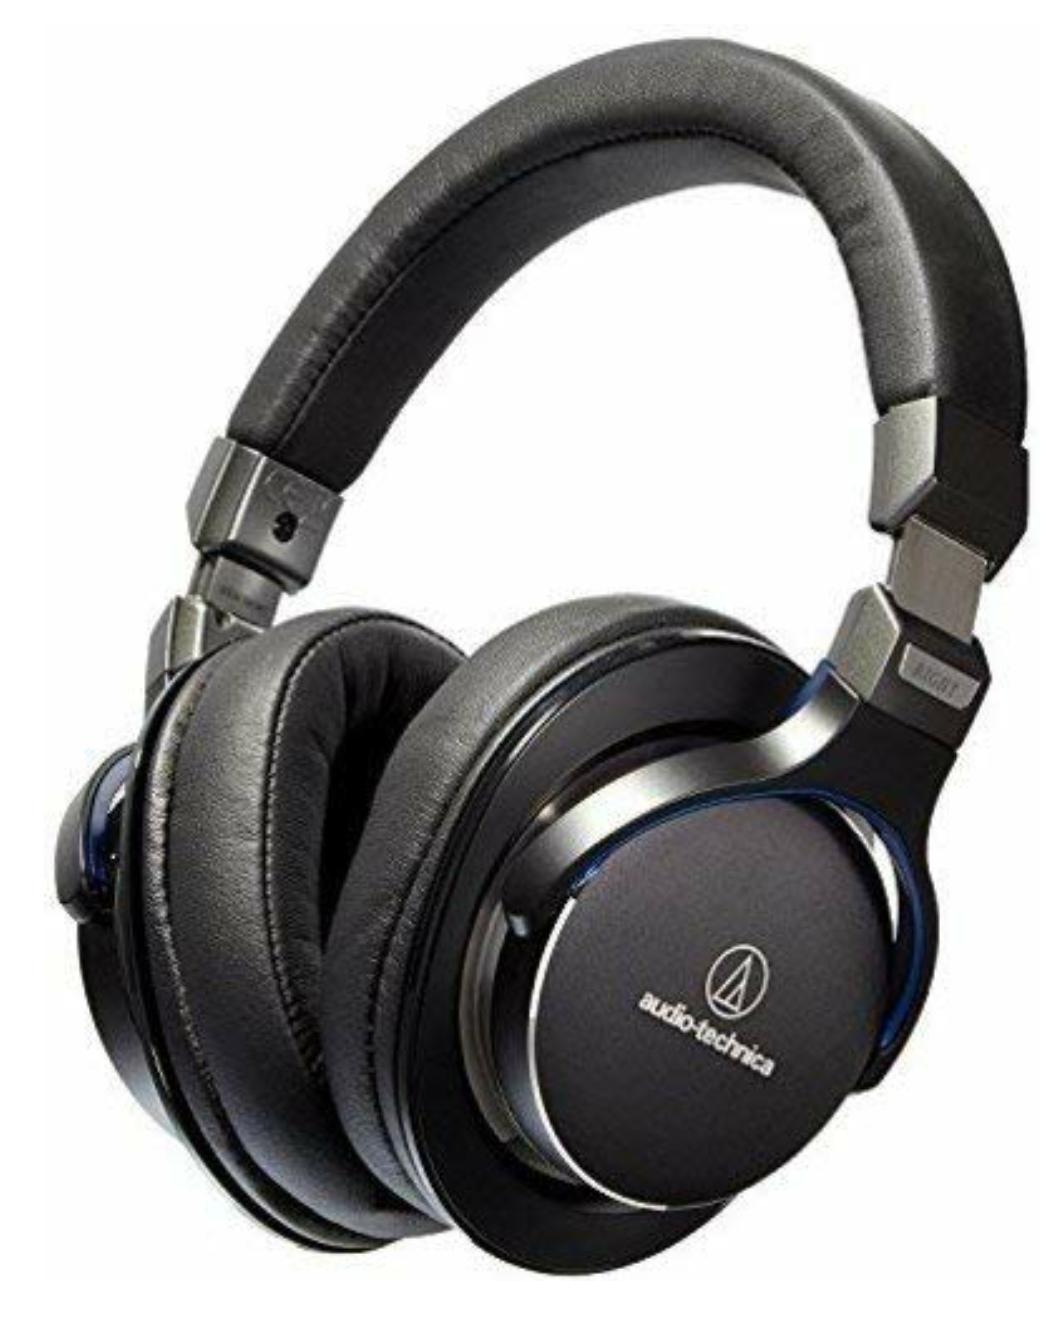 Audio Technica ATH-MSR7BK High-Resolution Over-Ear Kopfhörer schwarz